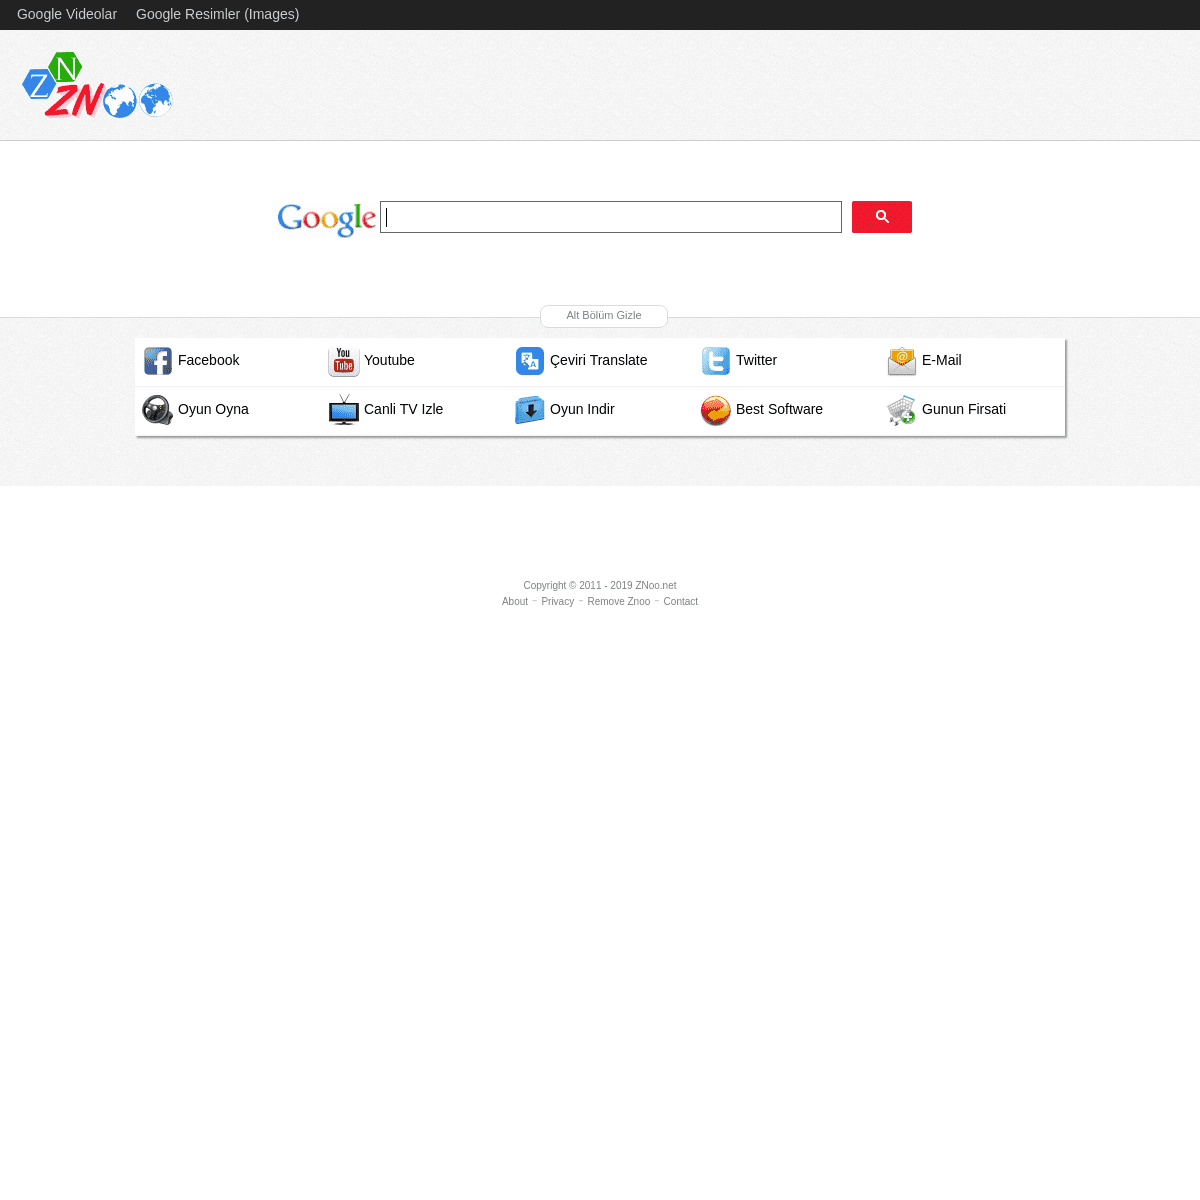 ArchiveBay.com - znoo.net - ZNoo.net - My Home Page - Search Engine